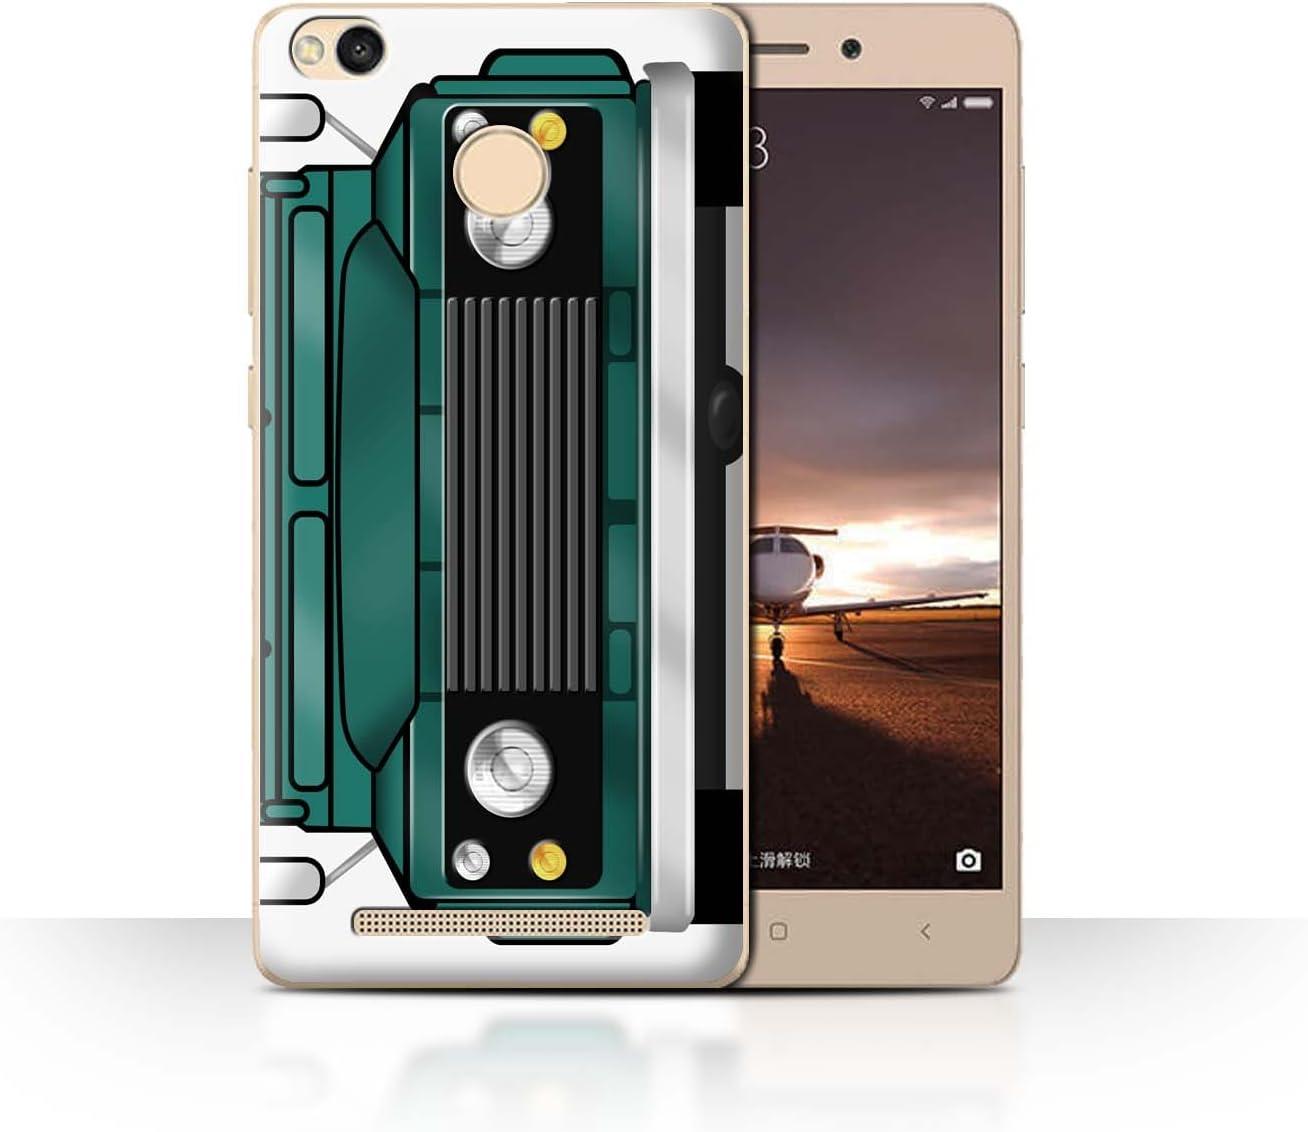 Stuff4® Phone Case/Cover/Skin/xia-CC/Classic 4 x 4 Defender Collection Vert Trident Xiaomi Redmi 3 Pro/3S Prime: Amazon.es: Informática